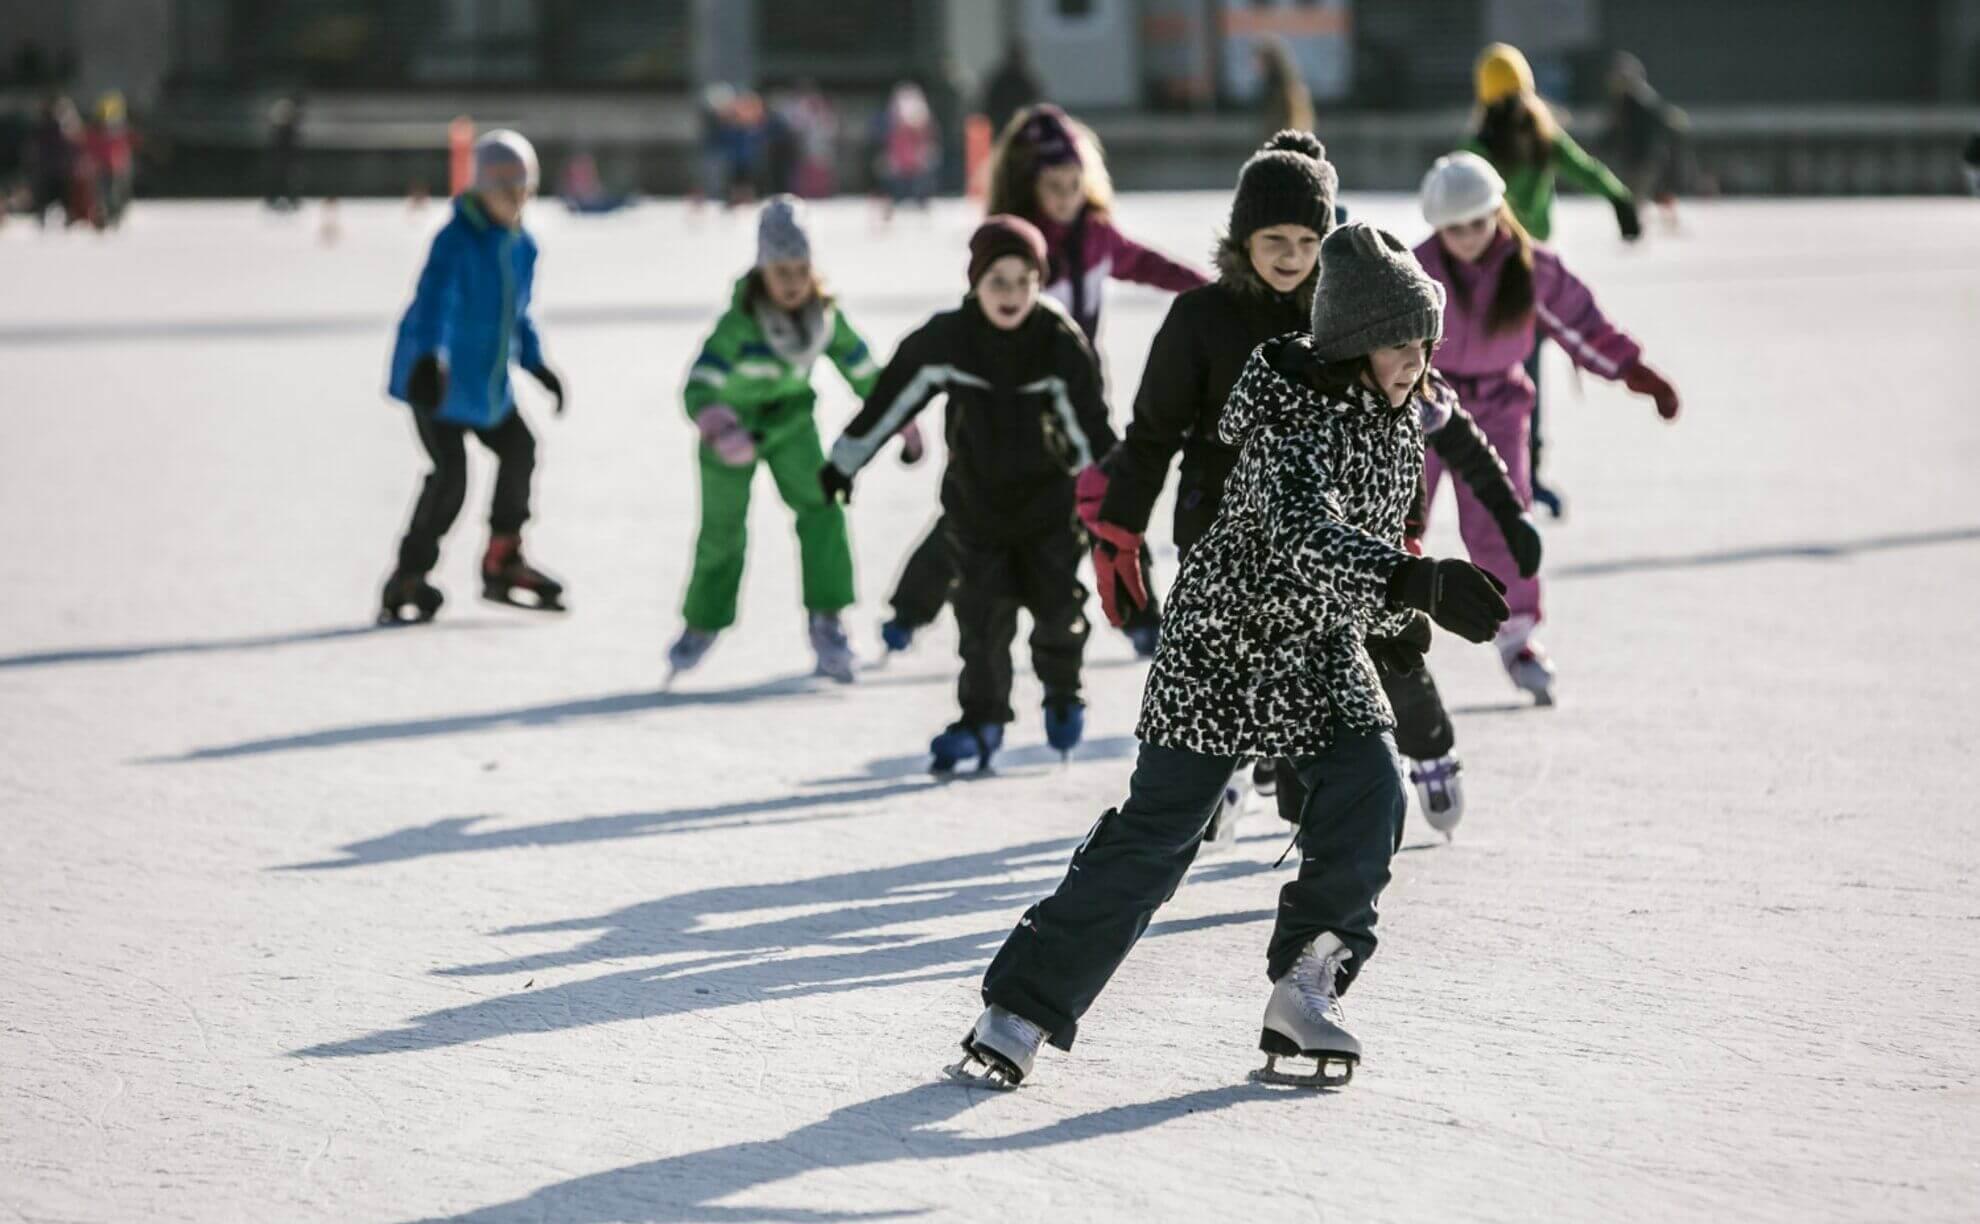 city-park-ice-rink-Budapest החלקה על הקרח בודפשט הונגריה